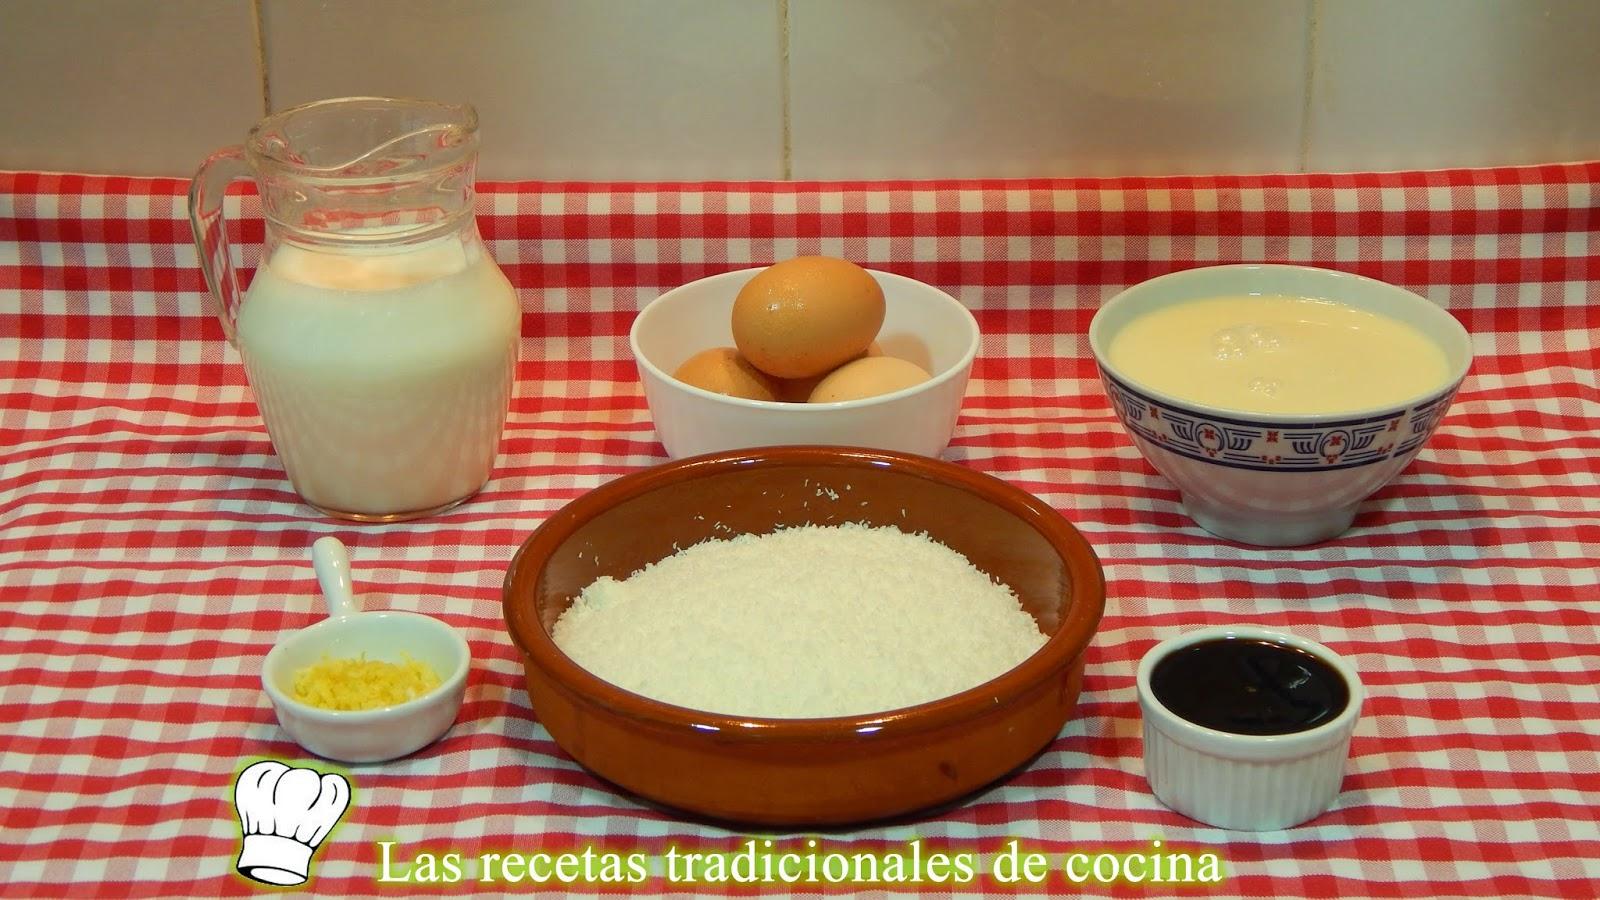 Receta fácil de flan de coco